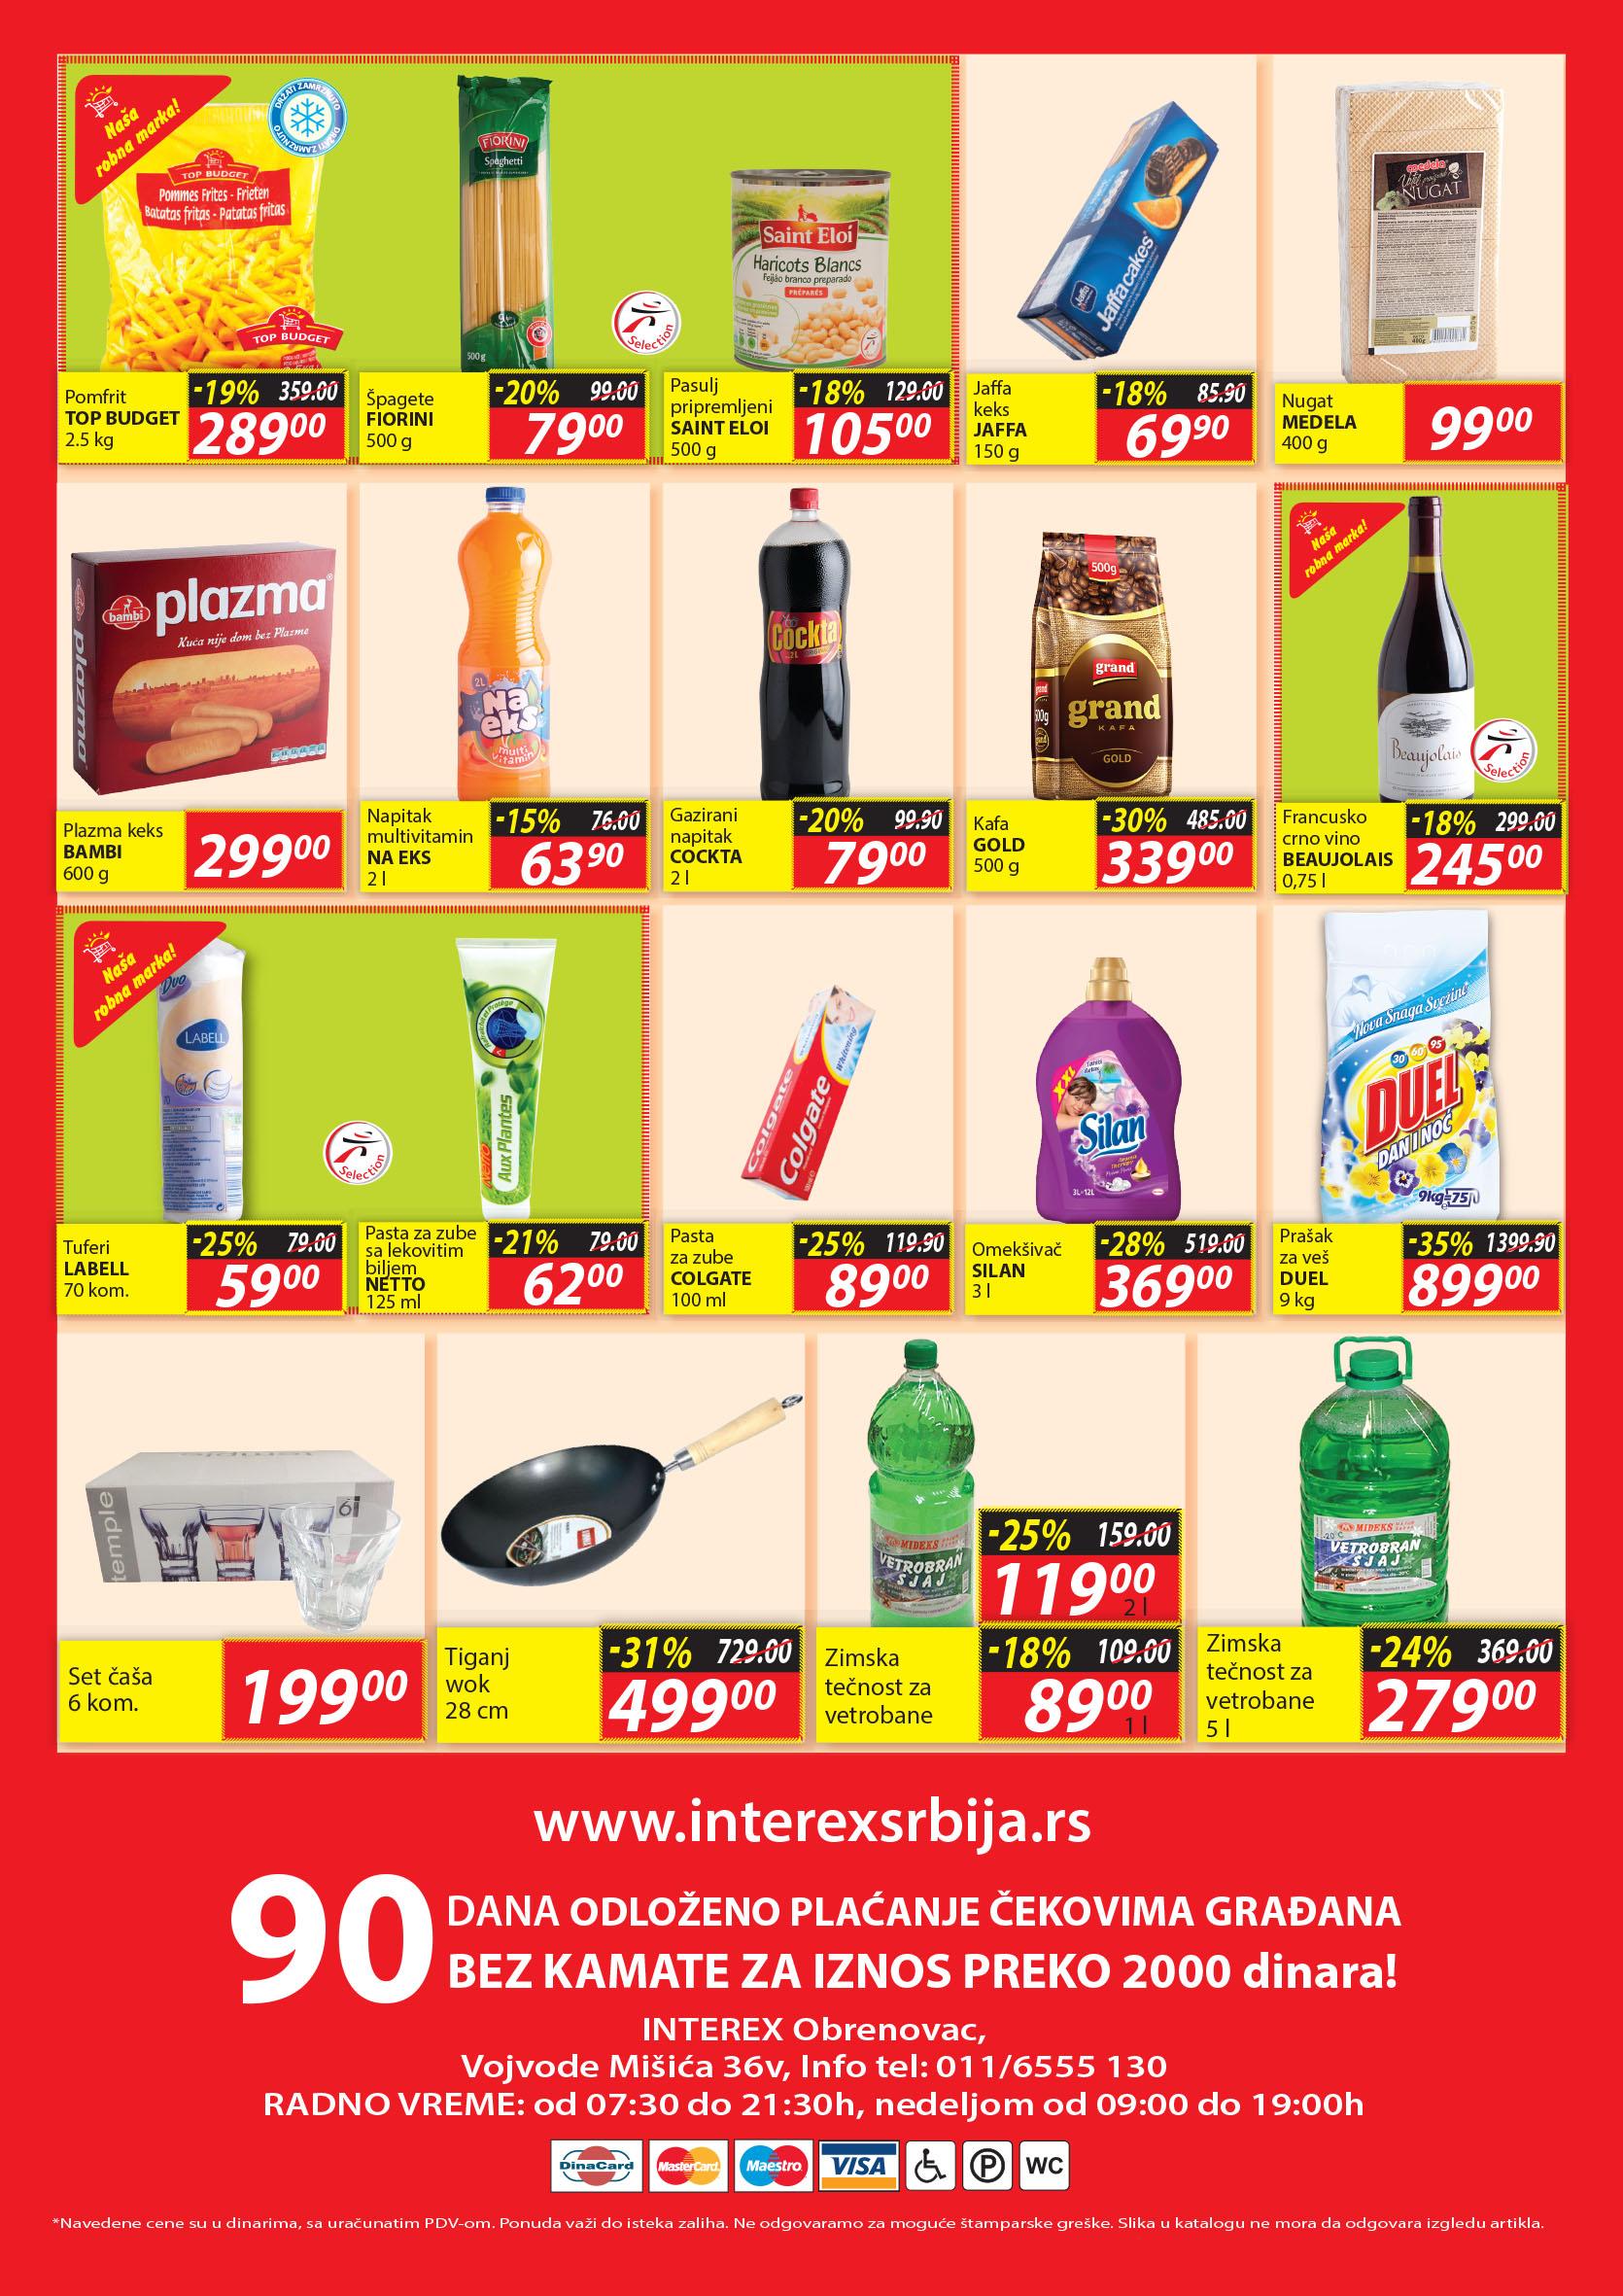 Interex katalog super cena